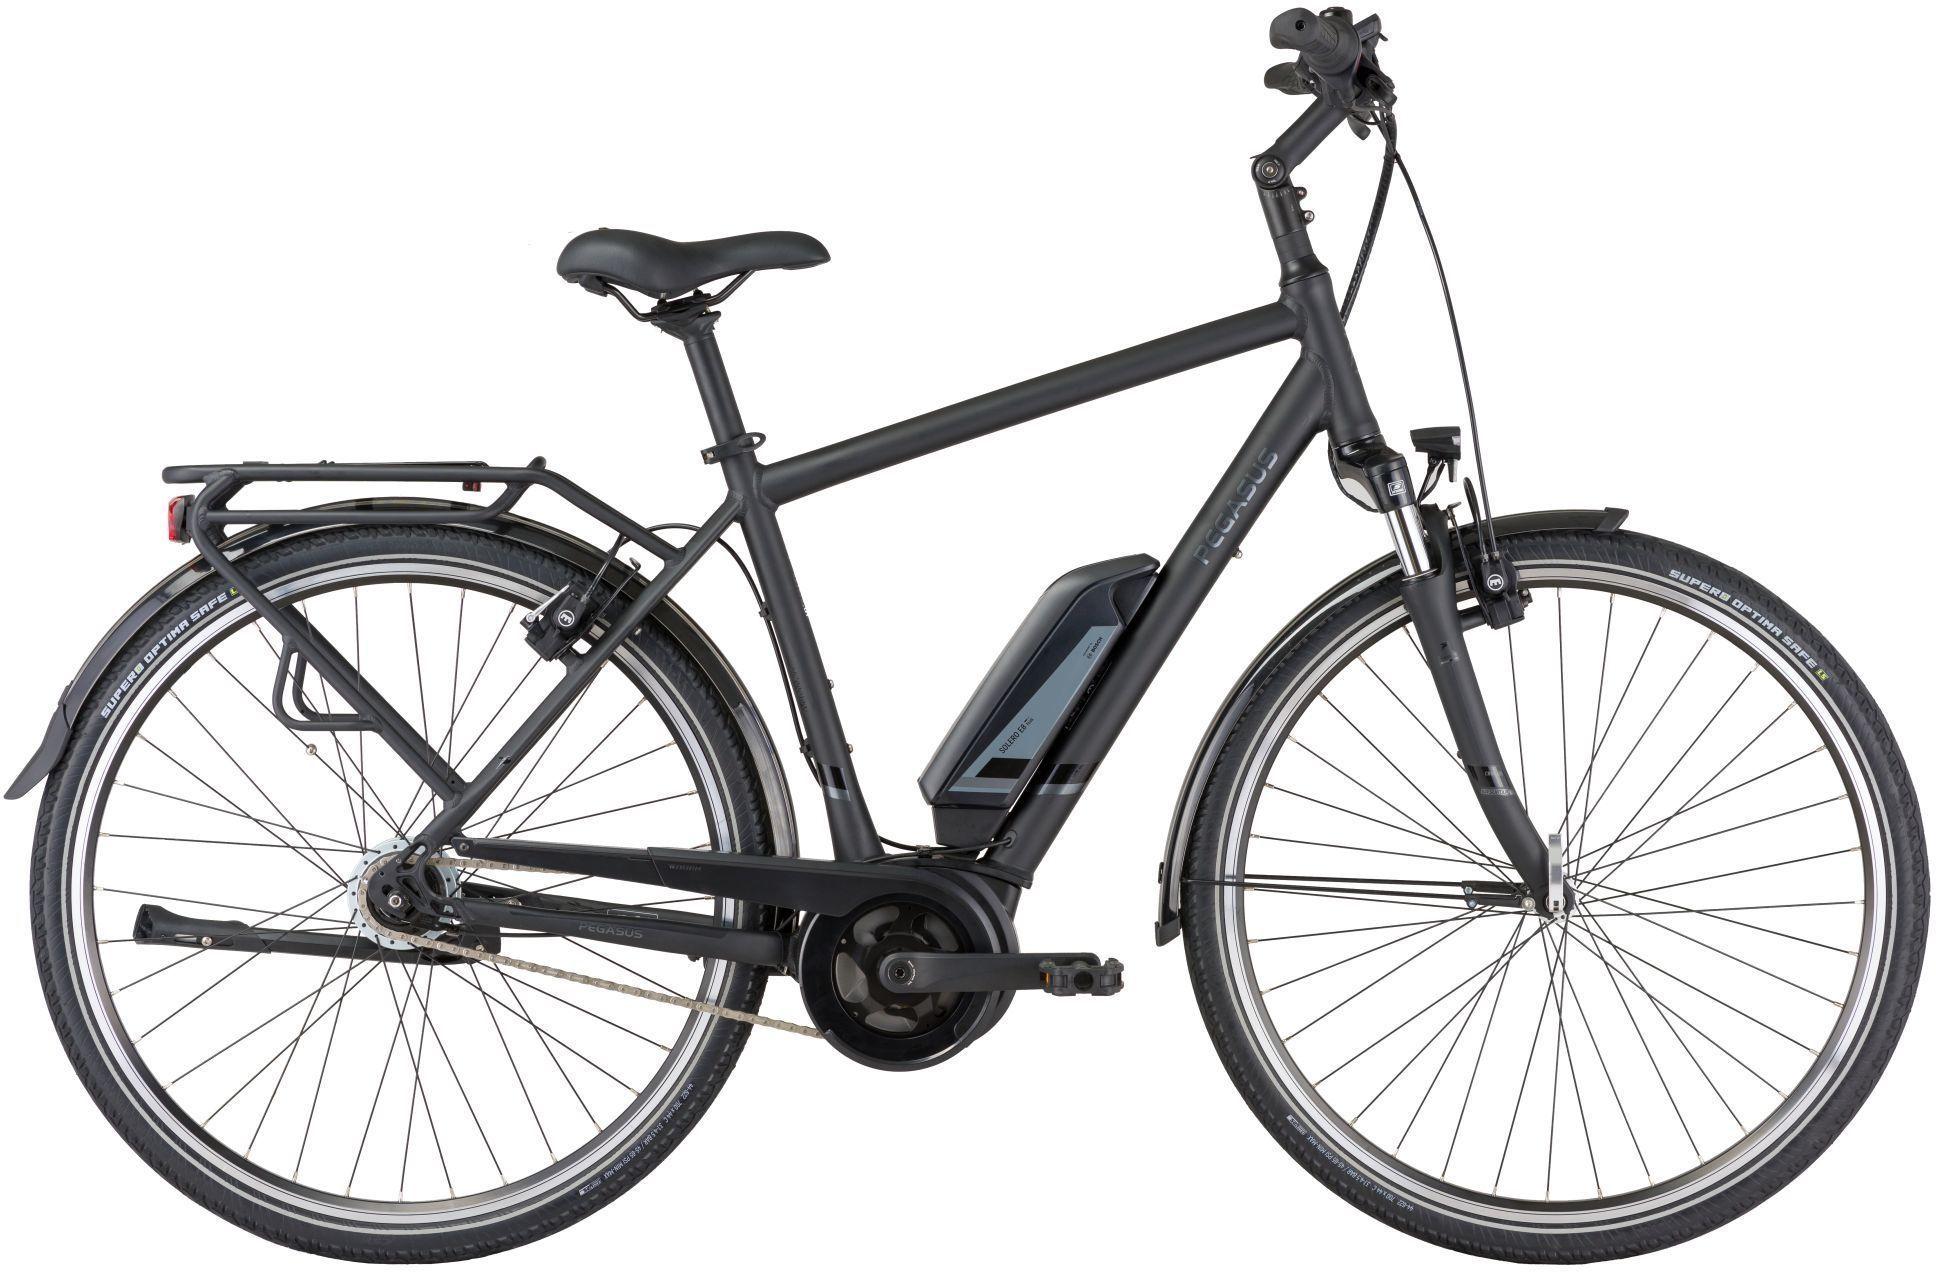 E-Bikes/Citybikes: Diamant  Solero E8R (400 Wh) 8 Gang Nabenschaltung Herrenfahrrad Diamant Modell 2021 28 Zoll 48 cm